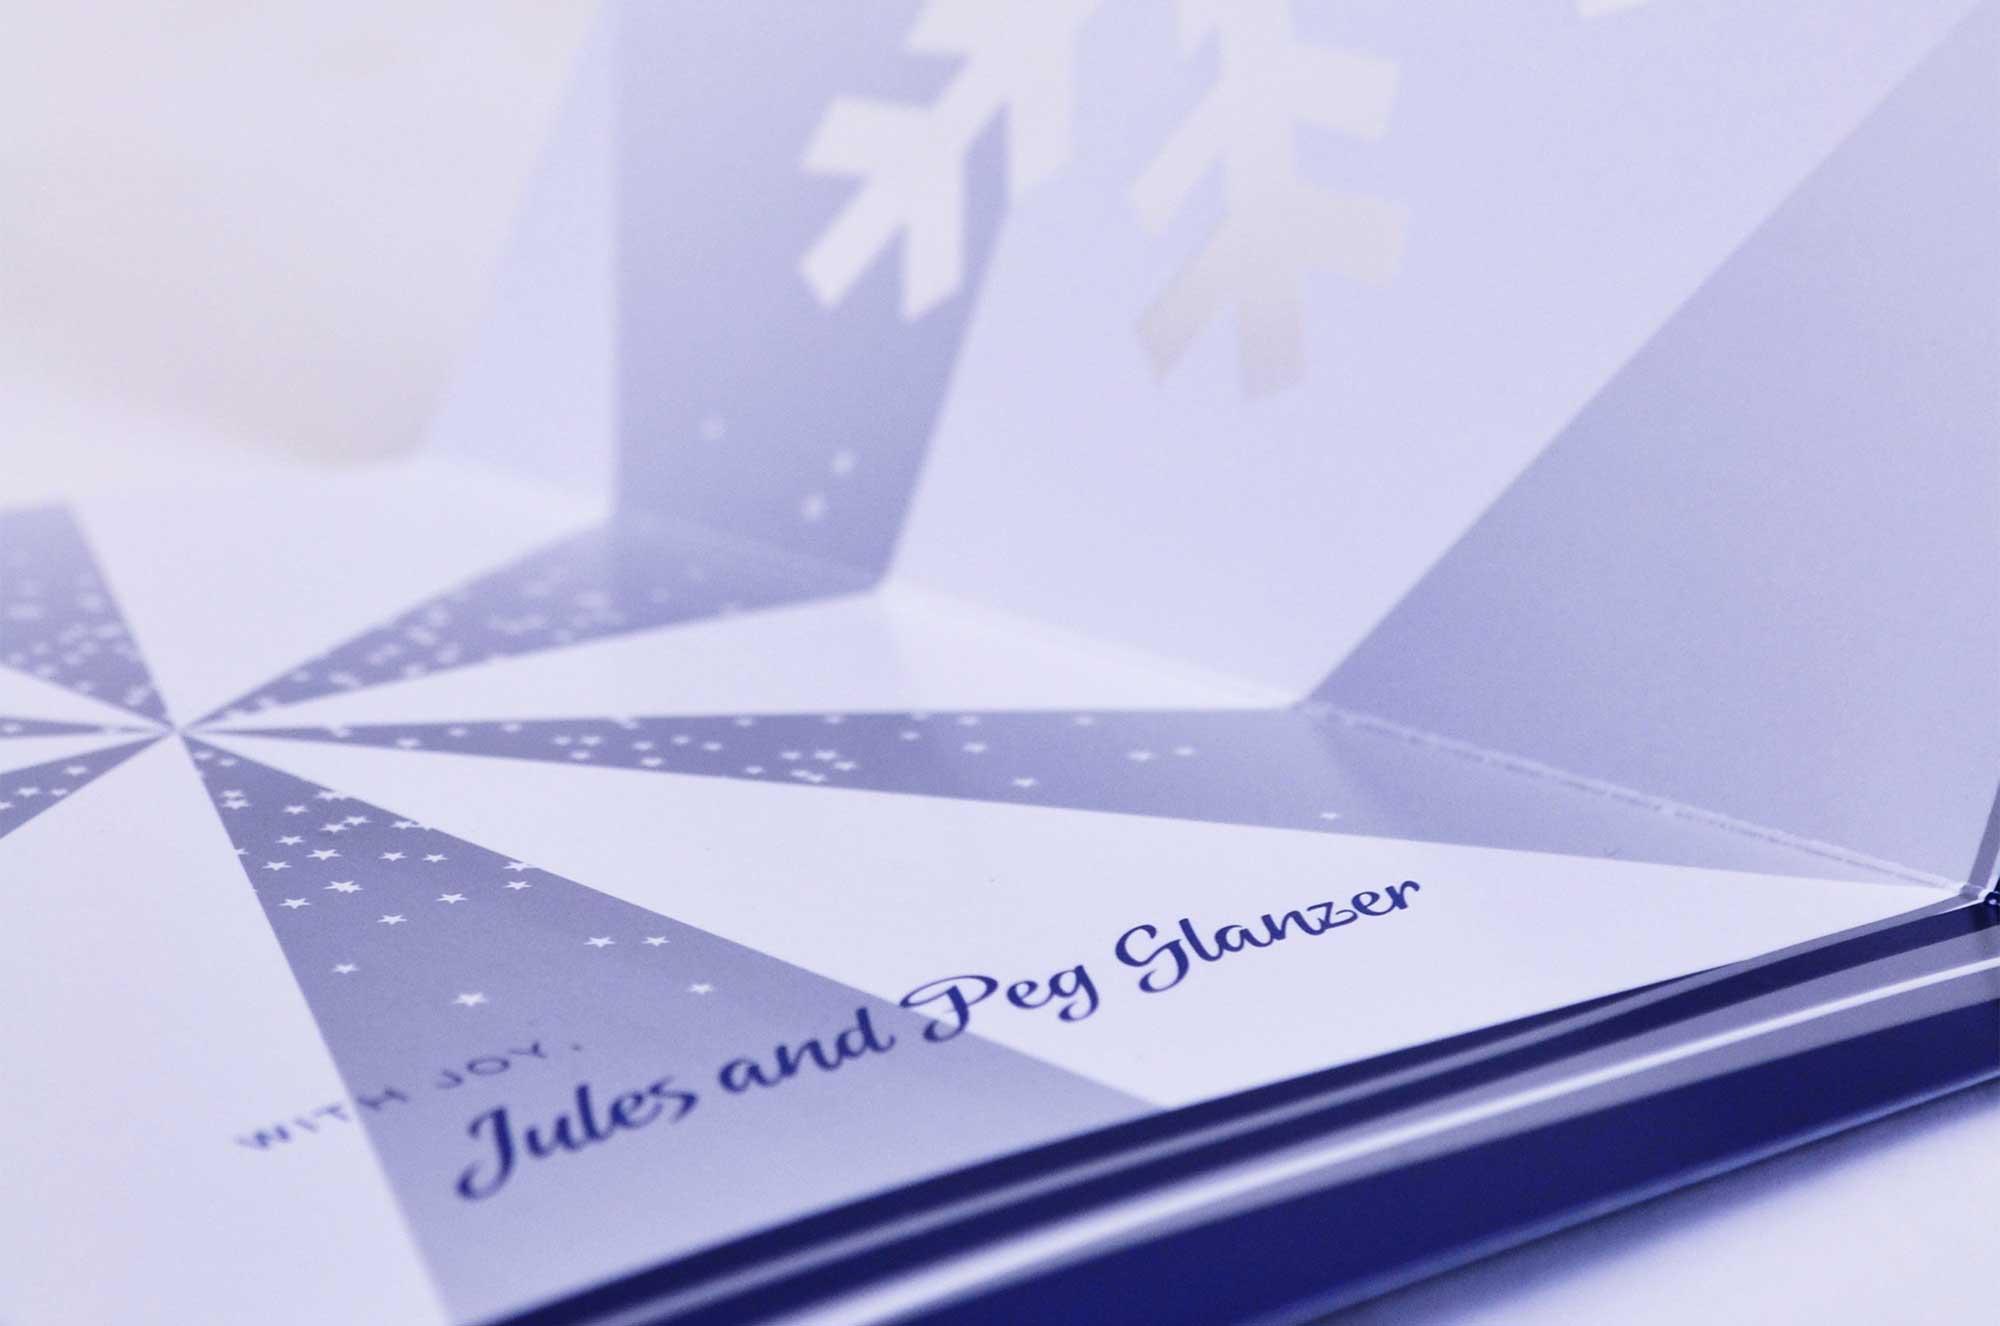 ChristmasCard5.jpg